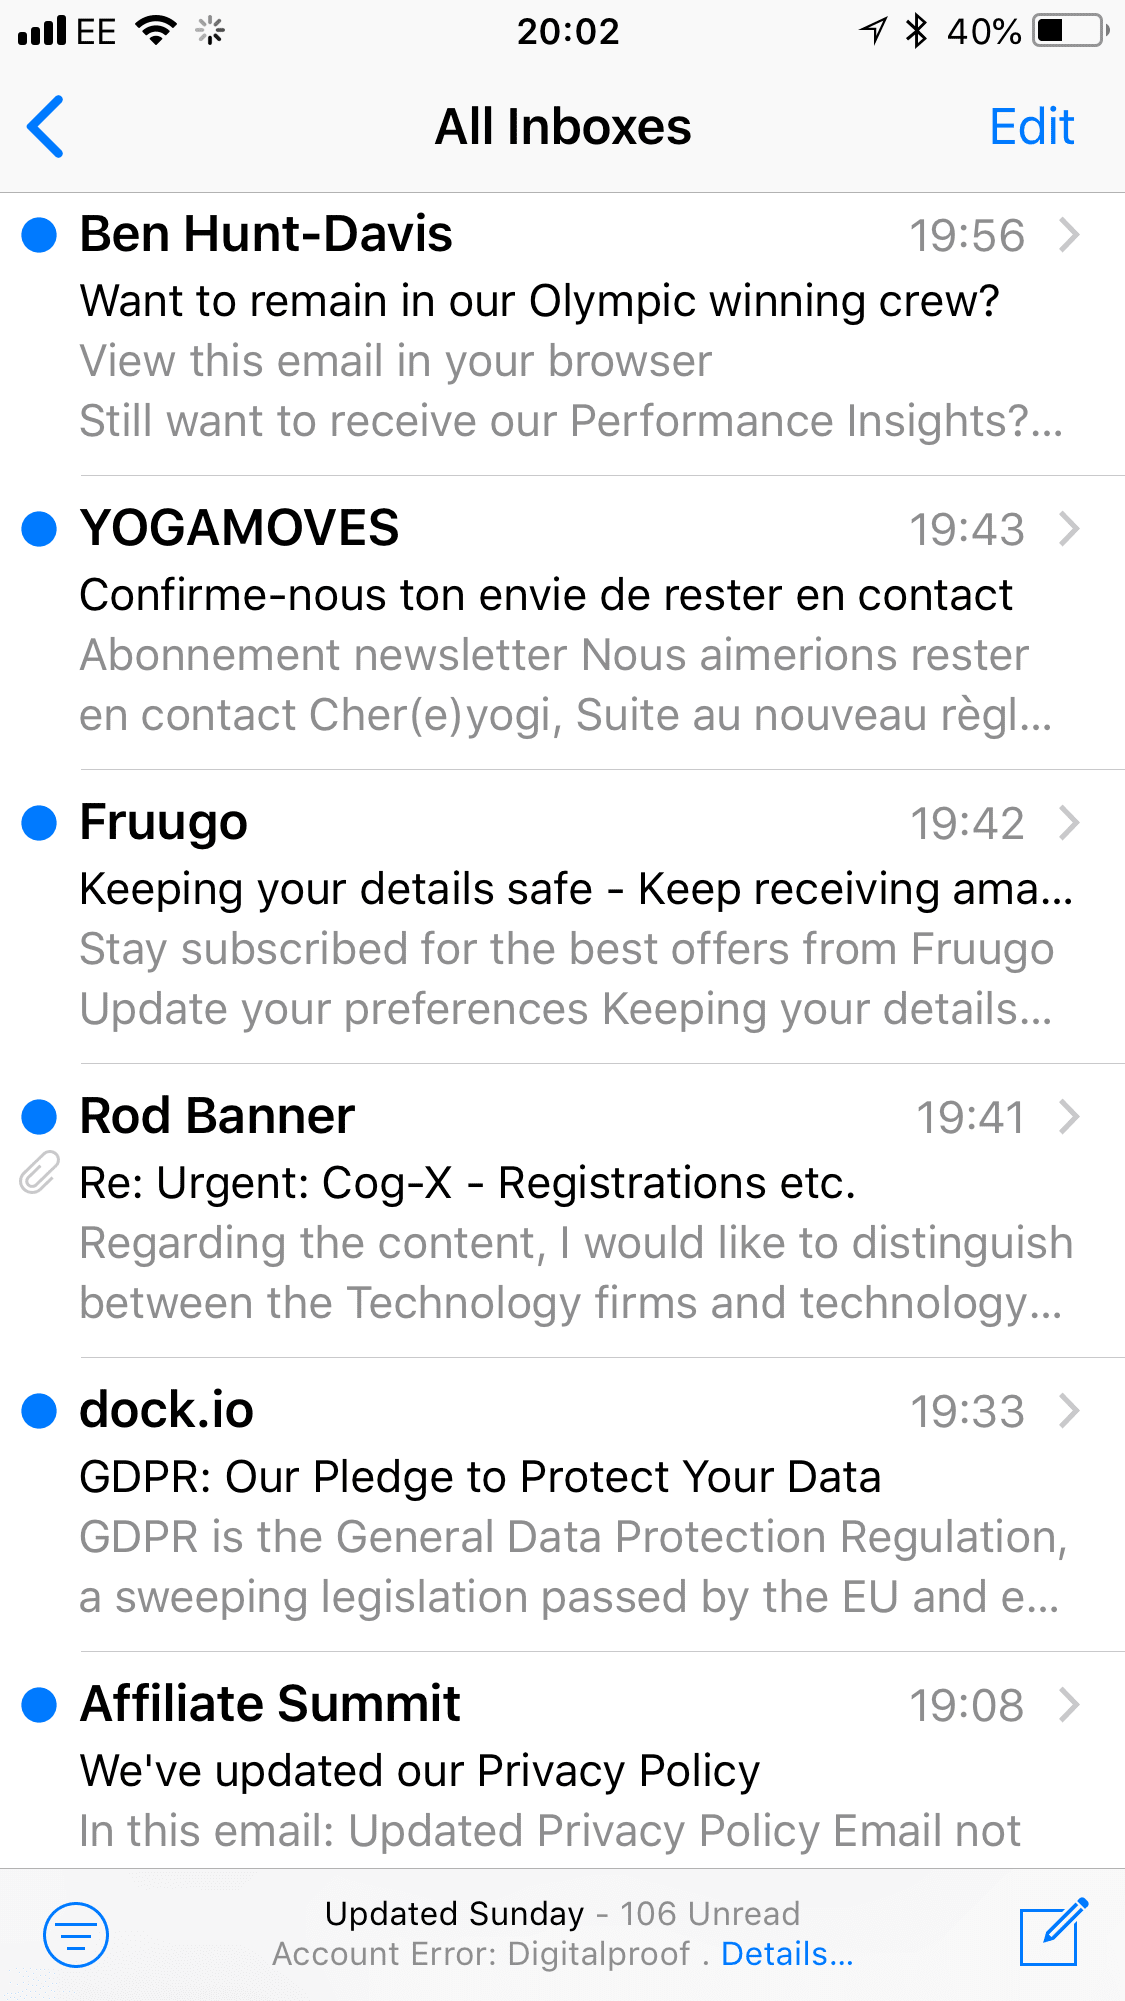 GDPR emails